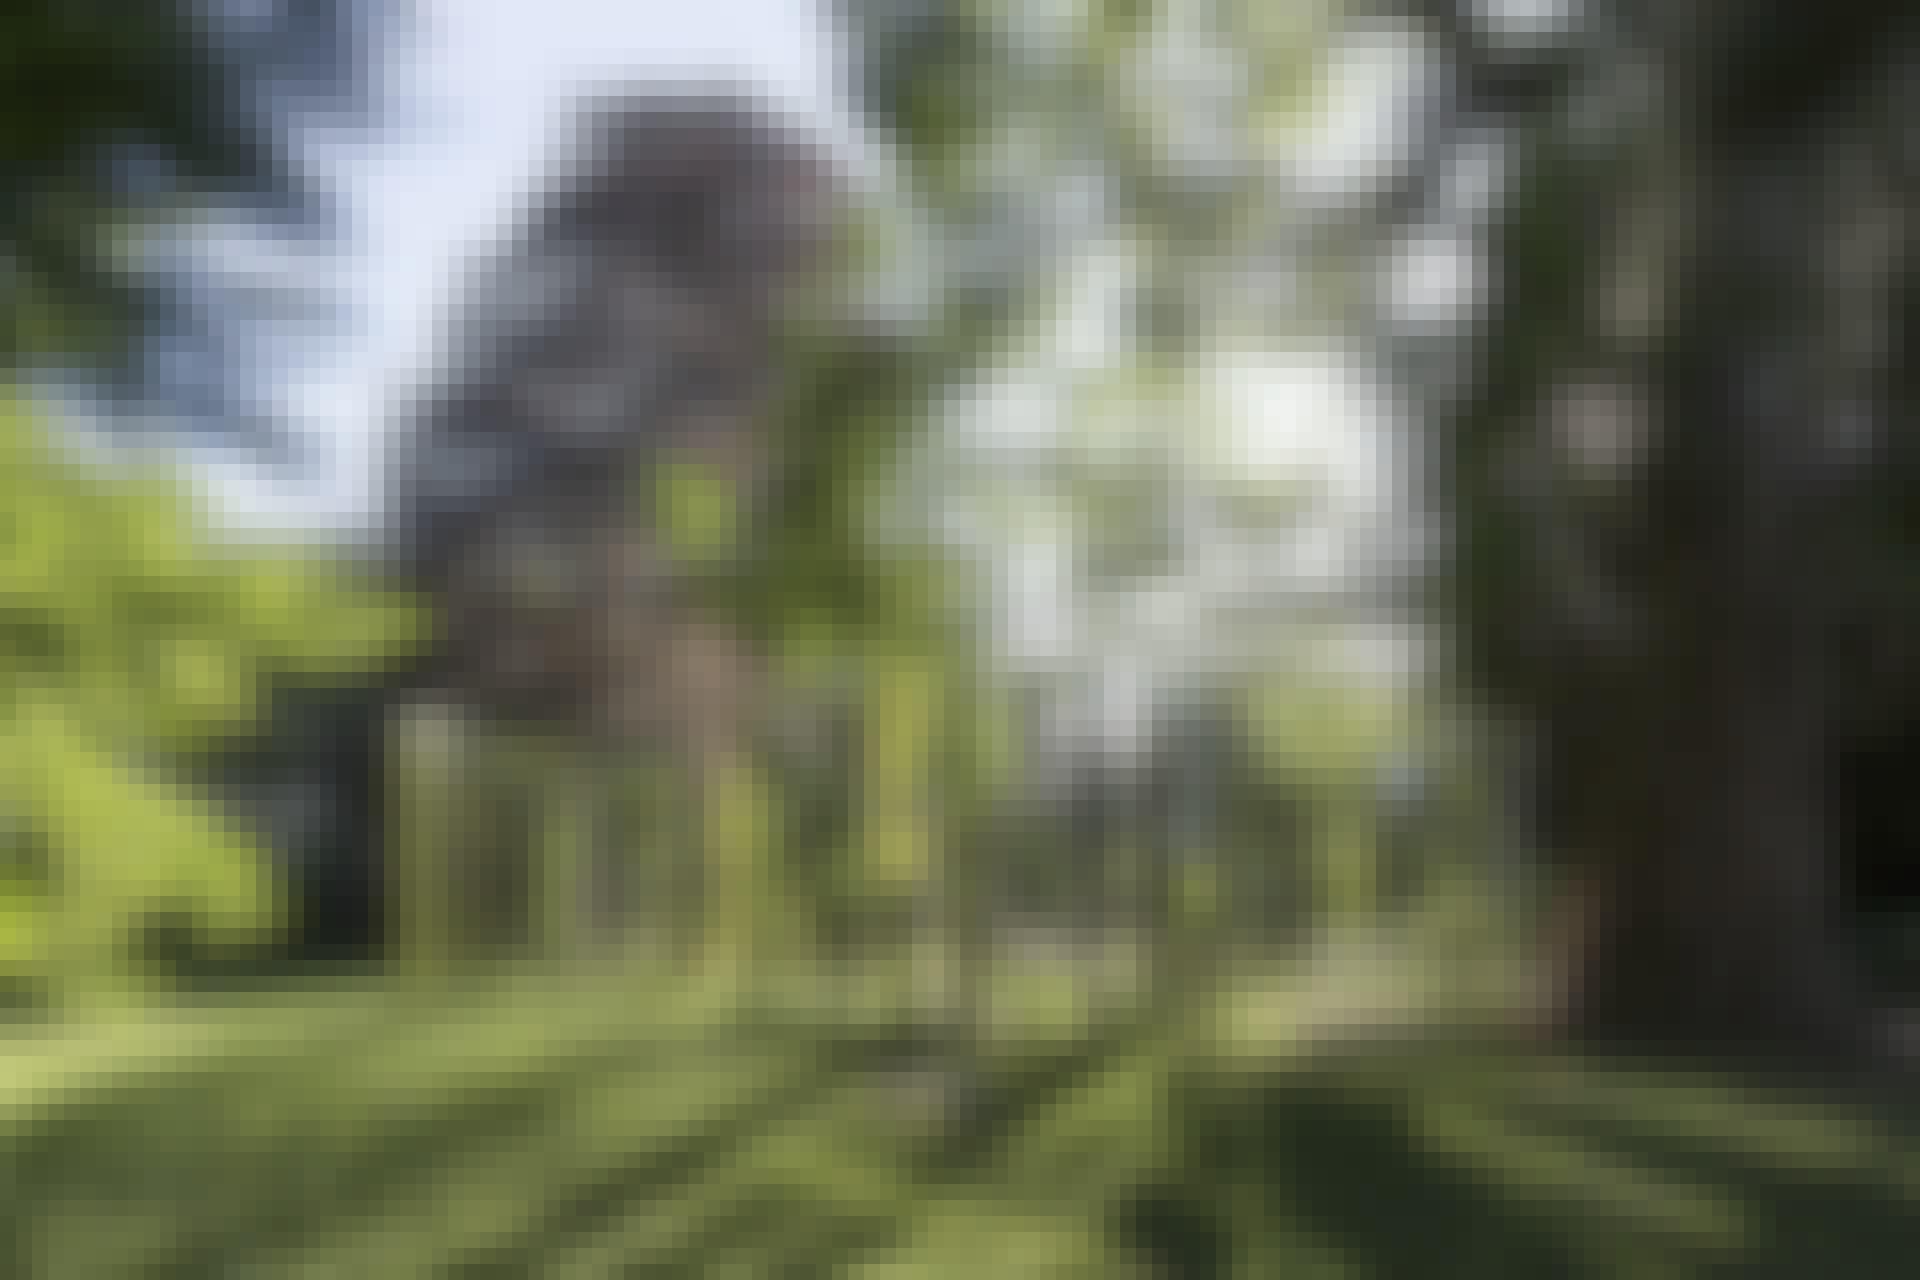 COM_2101_Anders-Sune-Berg-Gande_30B9990